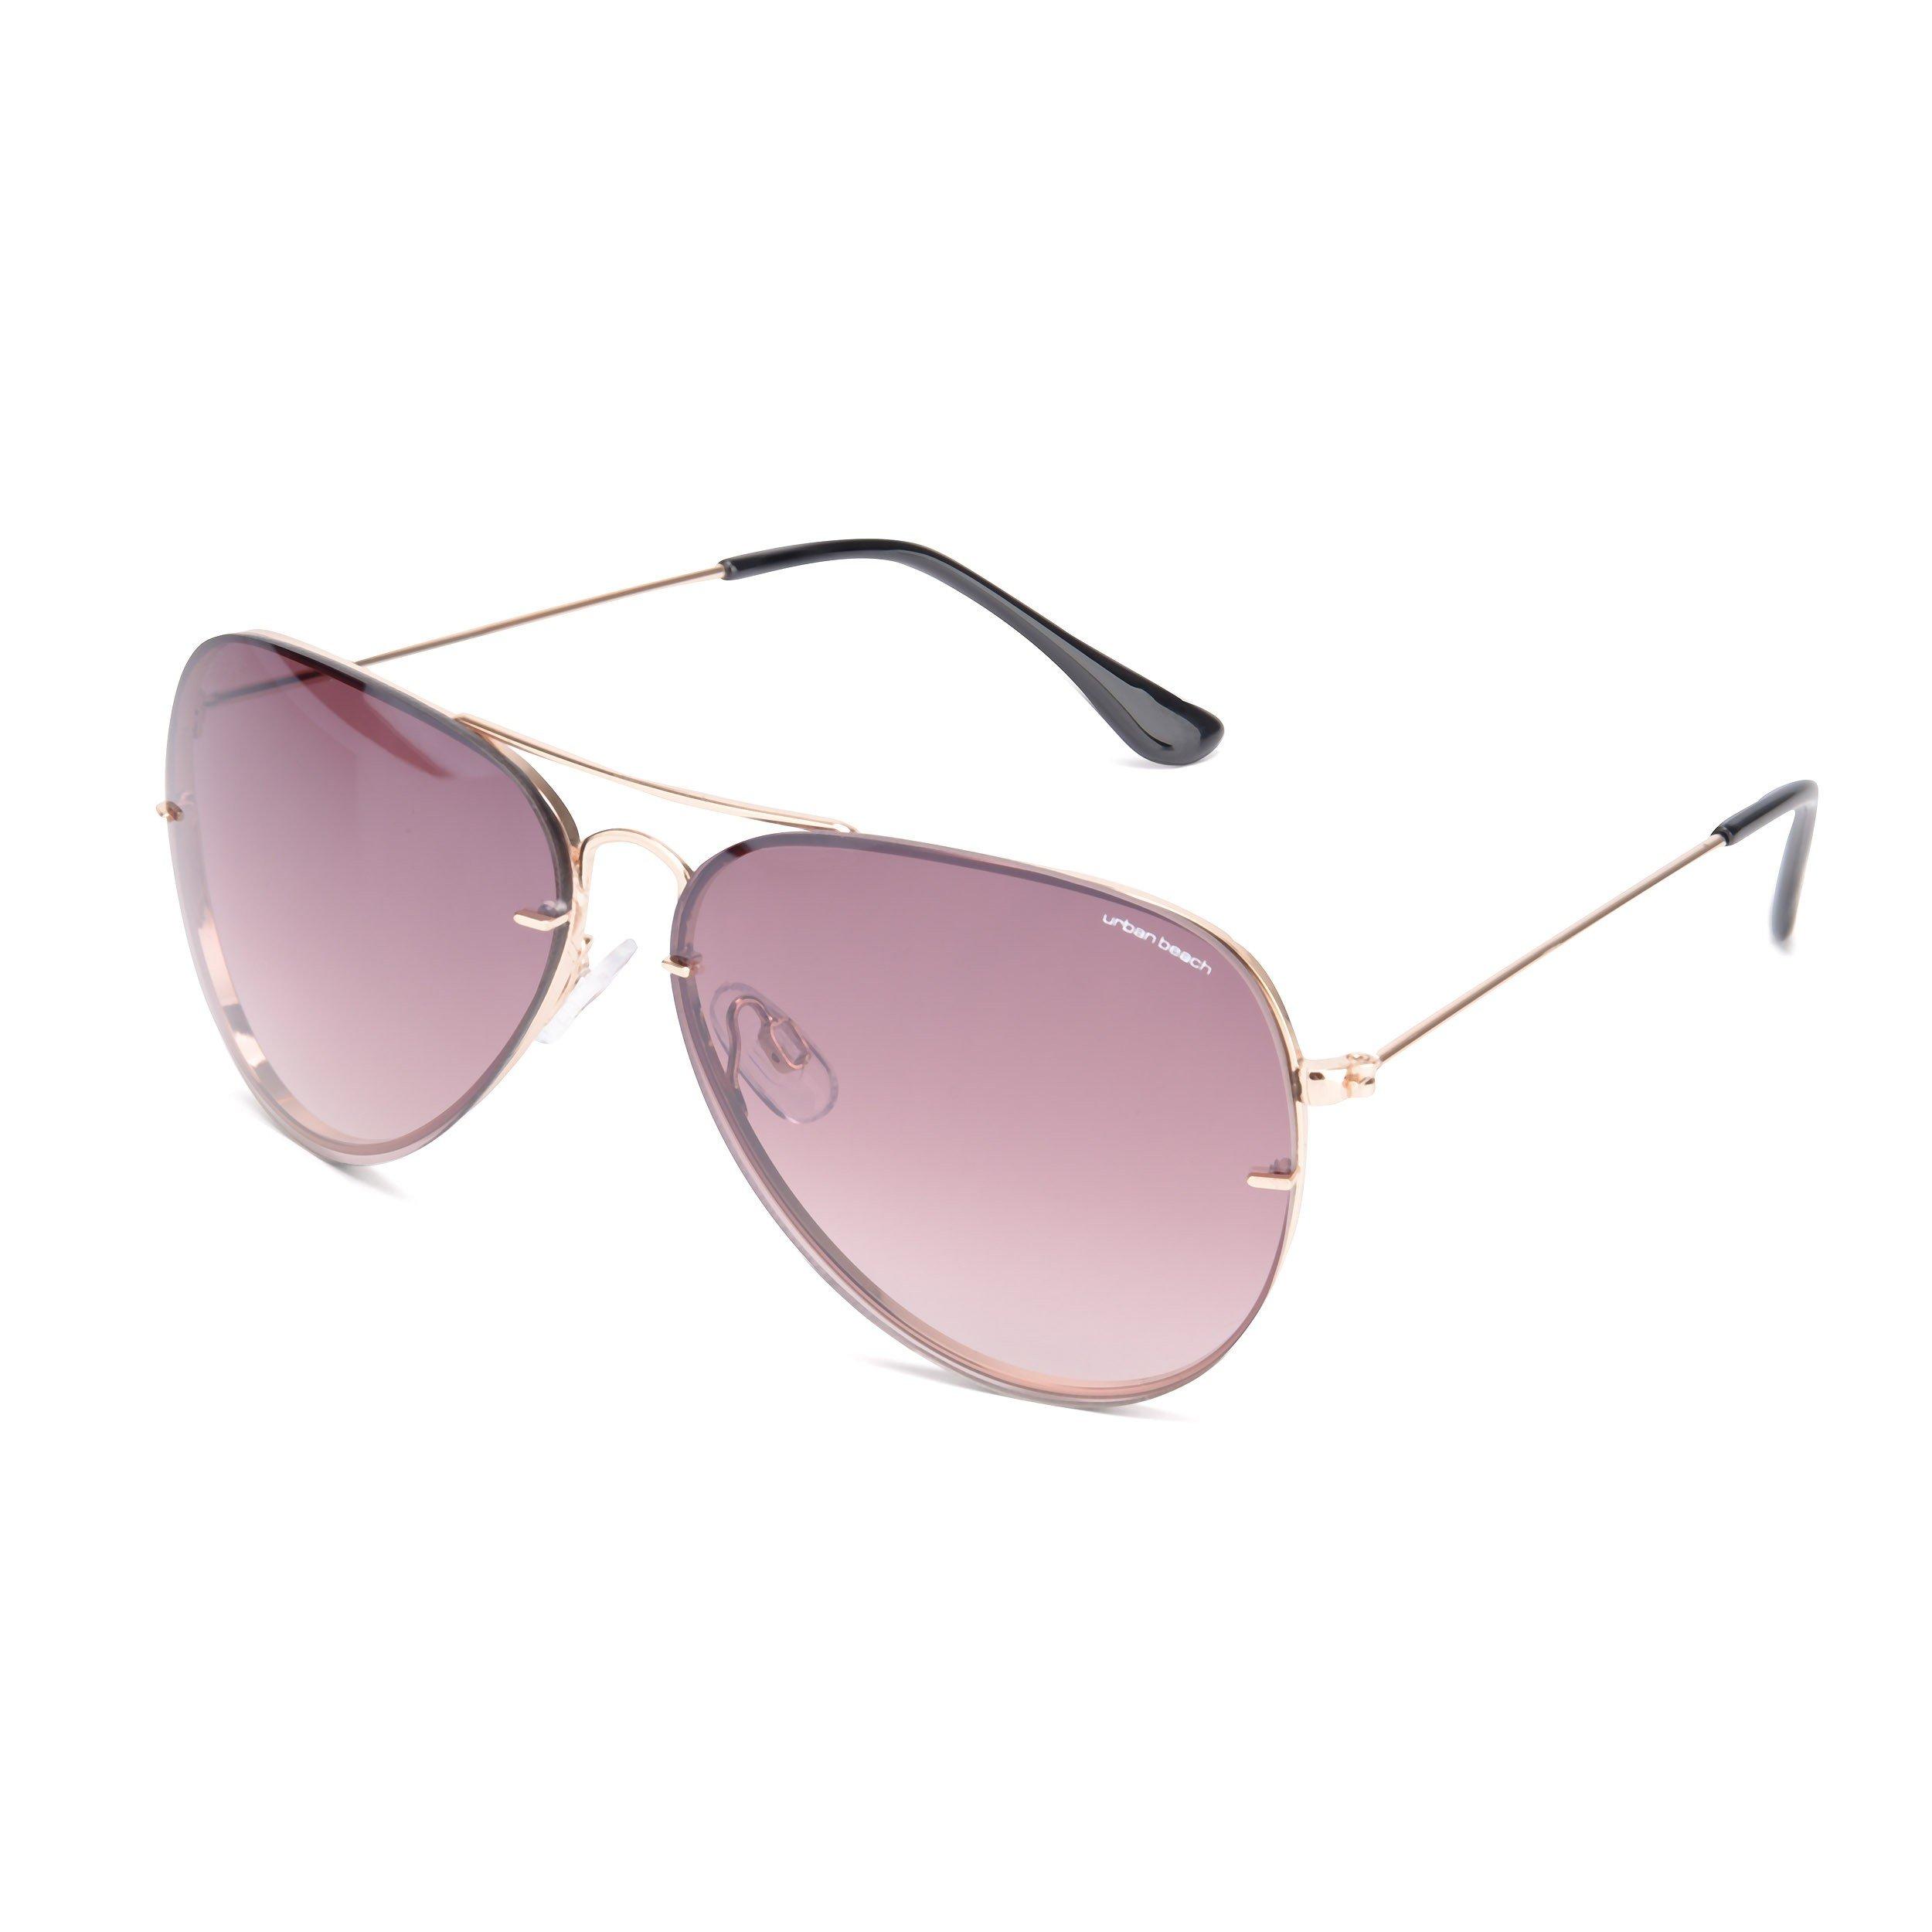 Unisex Brown Sunset Aviator Sunglasses